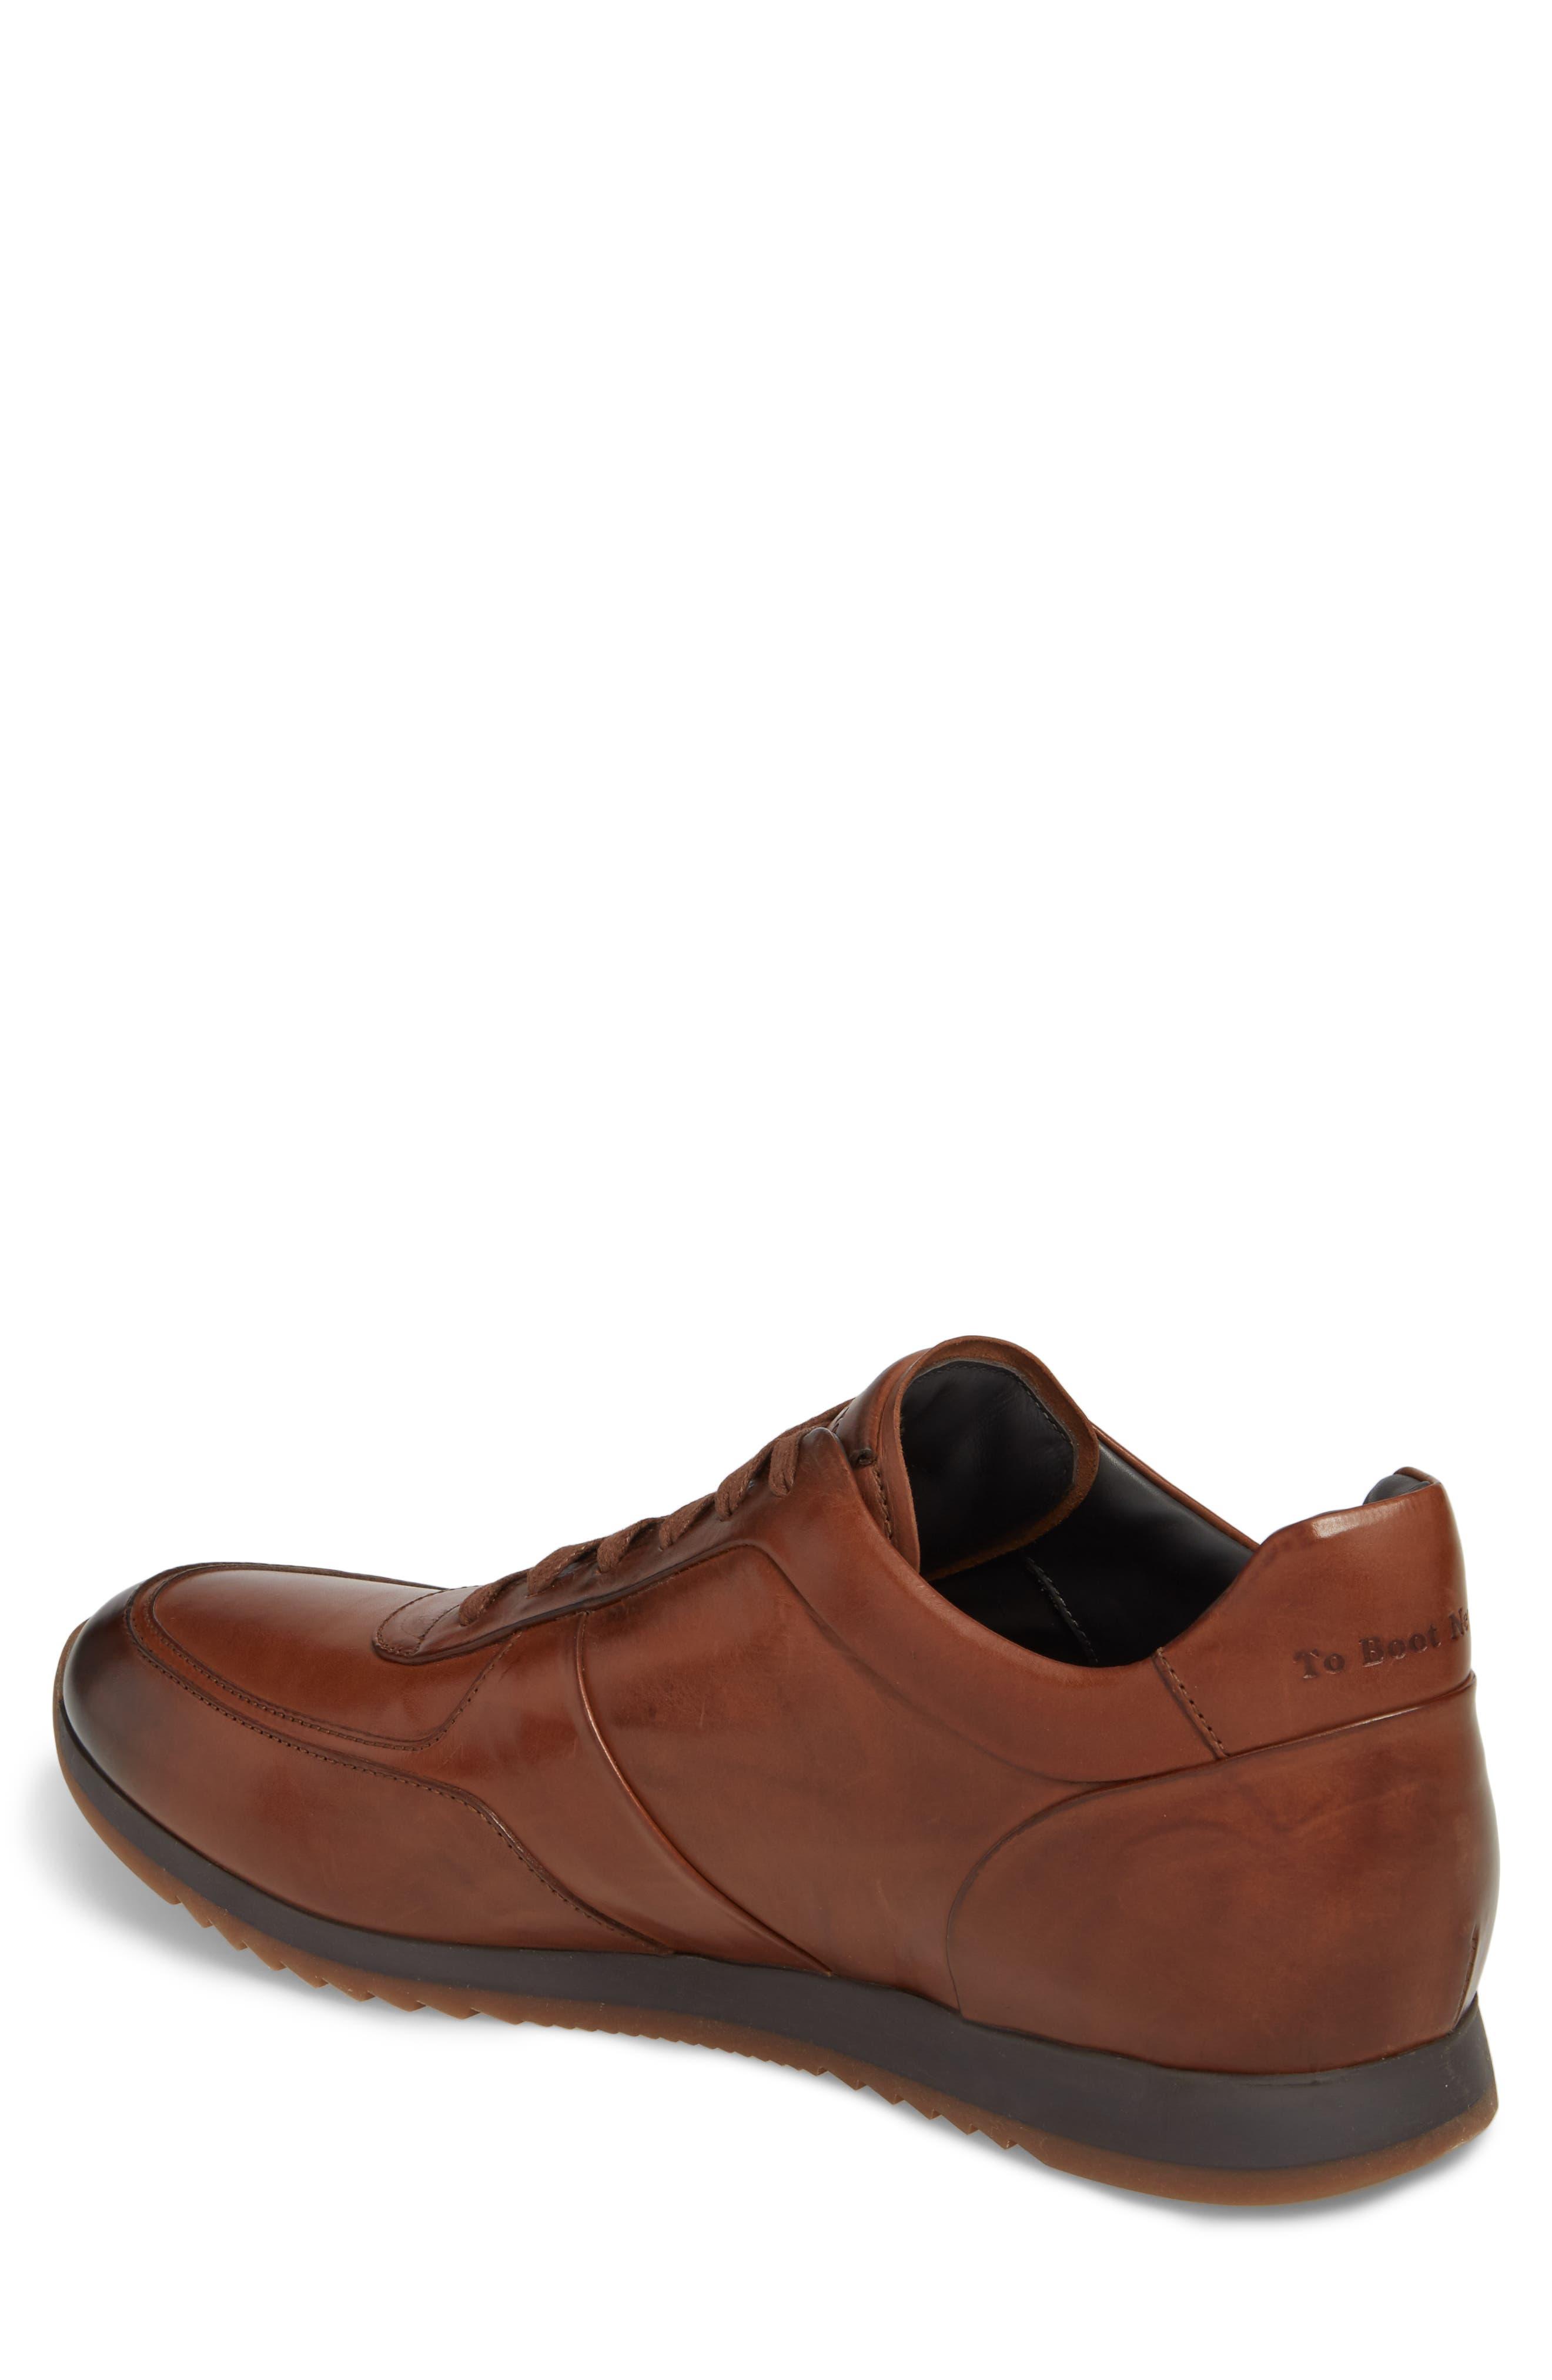 Lenox Low Top Sneaker,                             Alternate thumbnail 2, color,                             Tan Leather